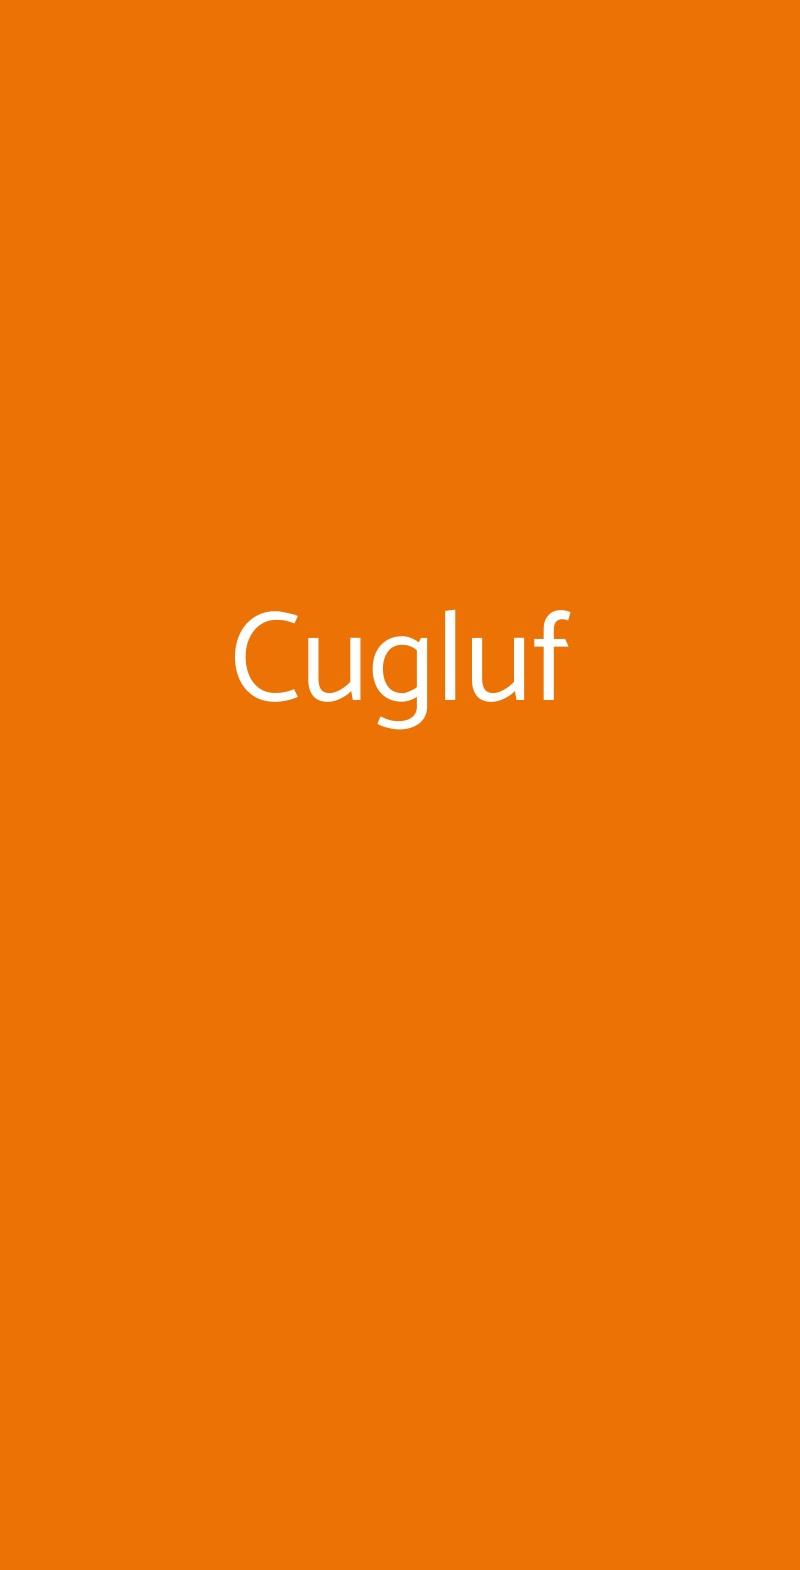 Cugluf Milano menù 1 pagina